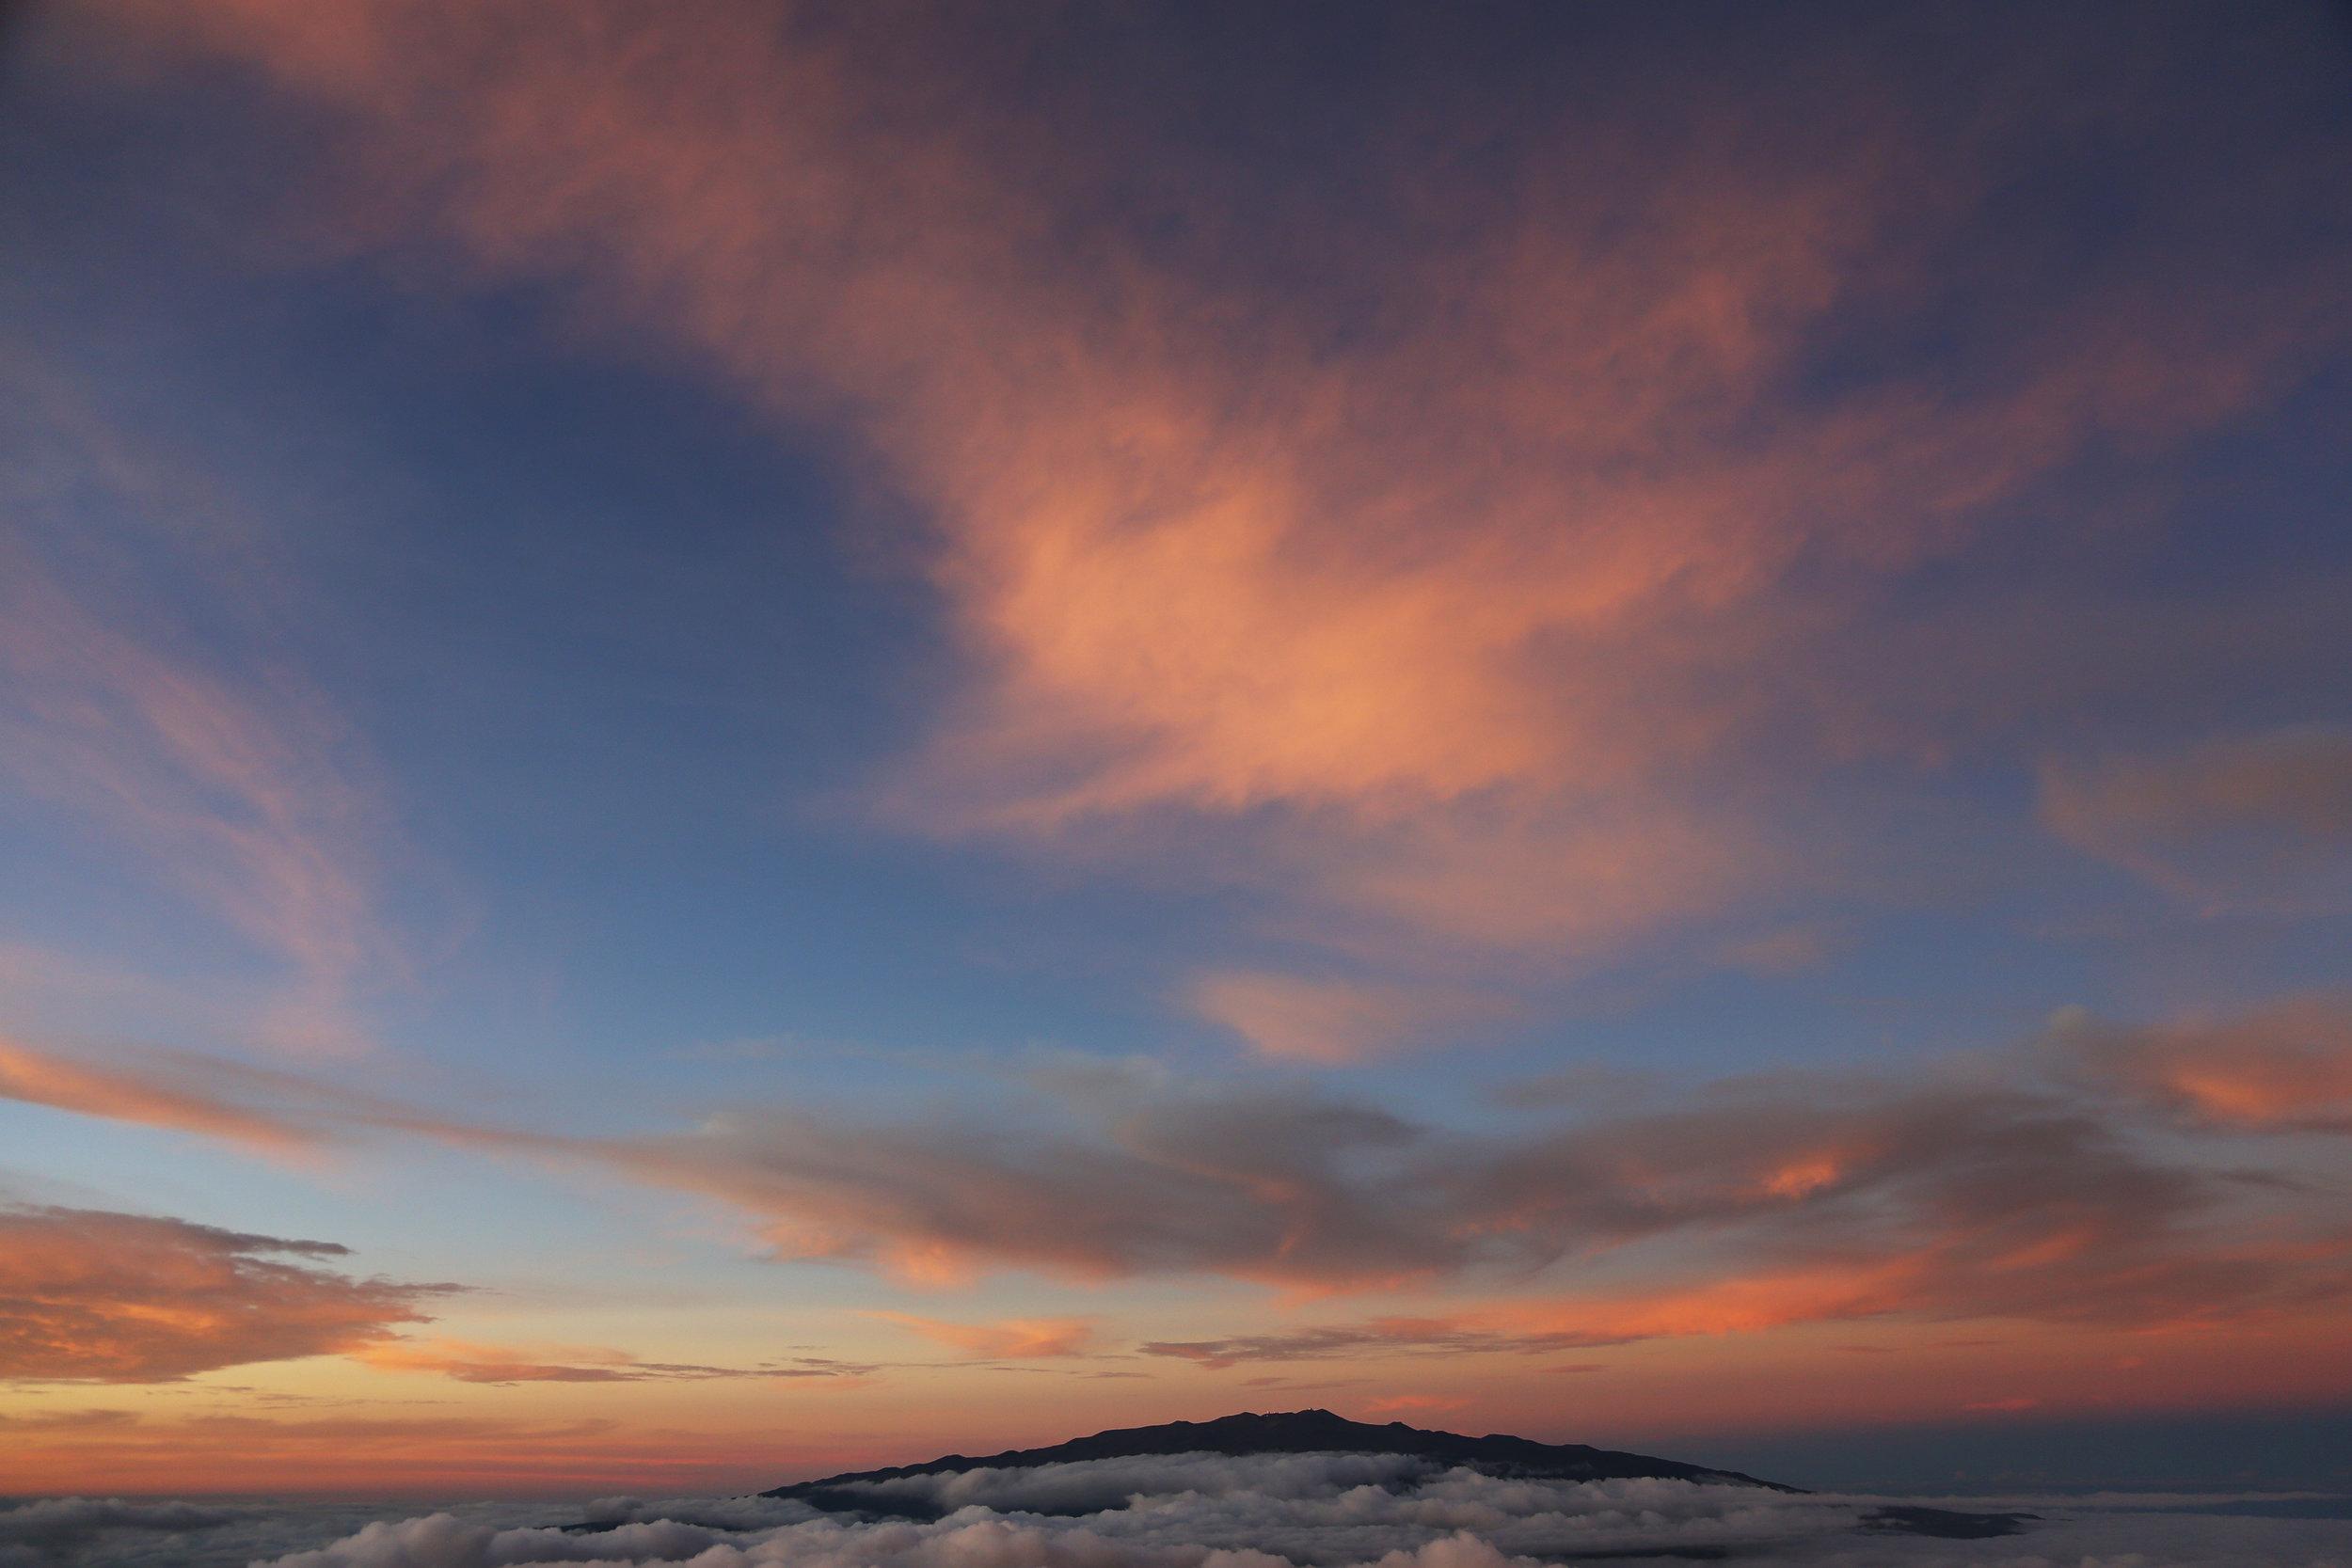 View of Mauna Kea at sunset from high on Mauna Loa